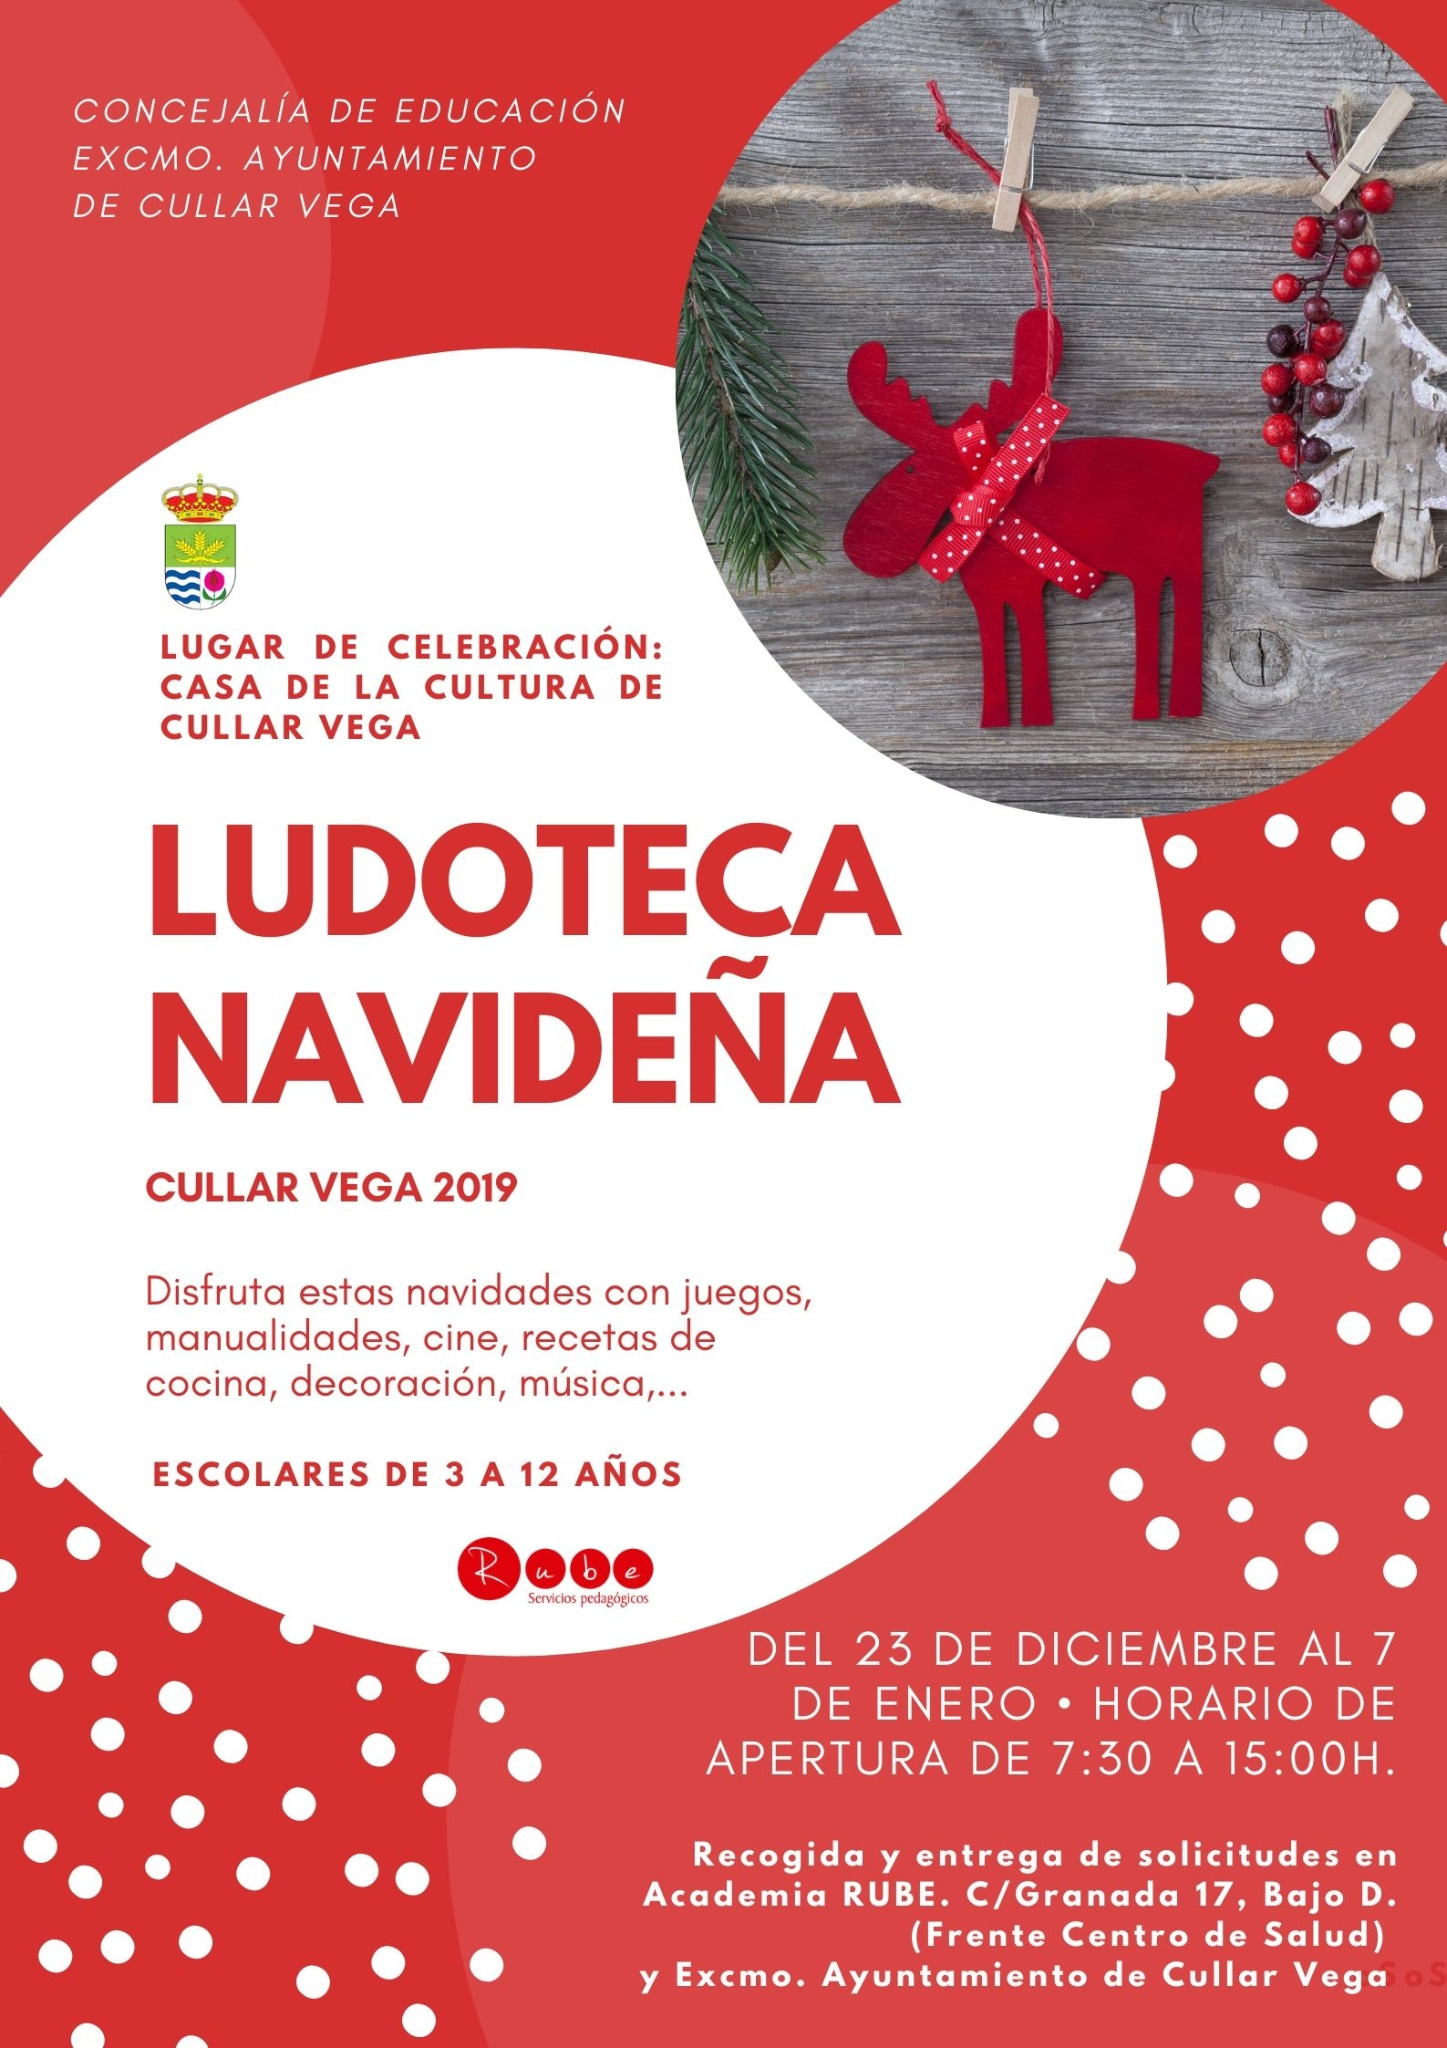 Ludoteca Navideña 2019-2020